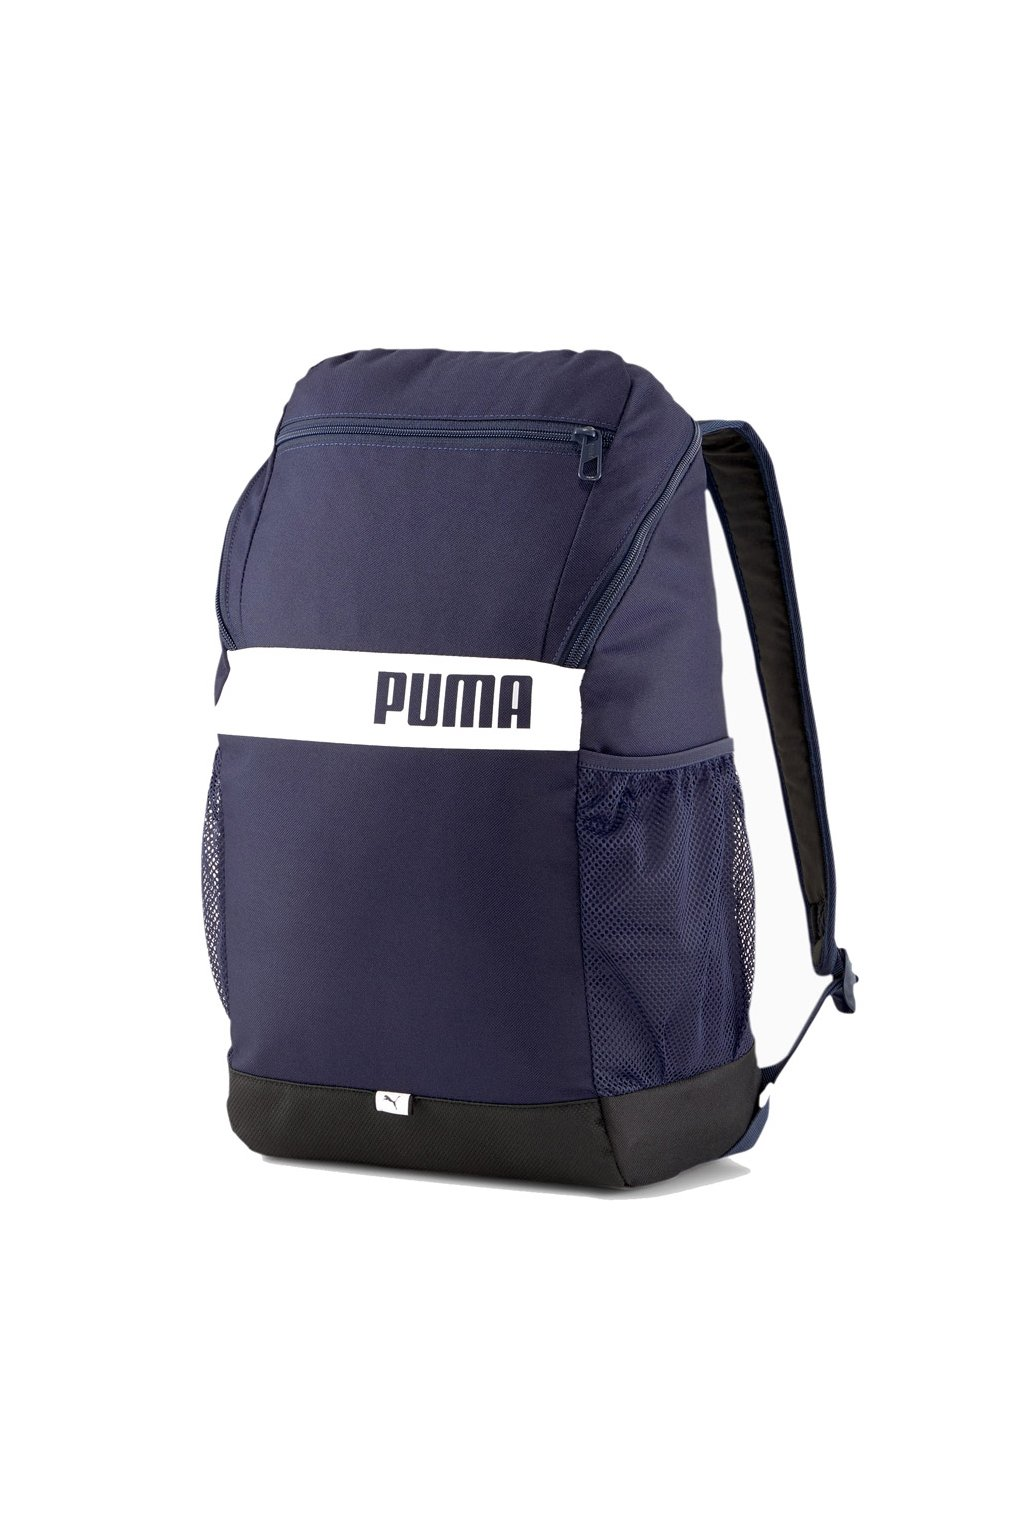 Batoh Puma Plus Backpack tmavo modrý 077292 02